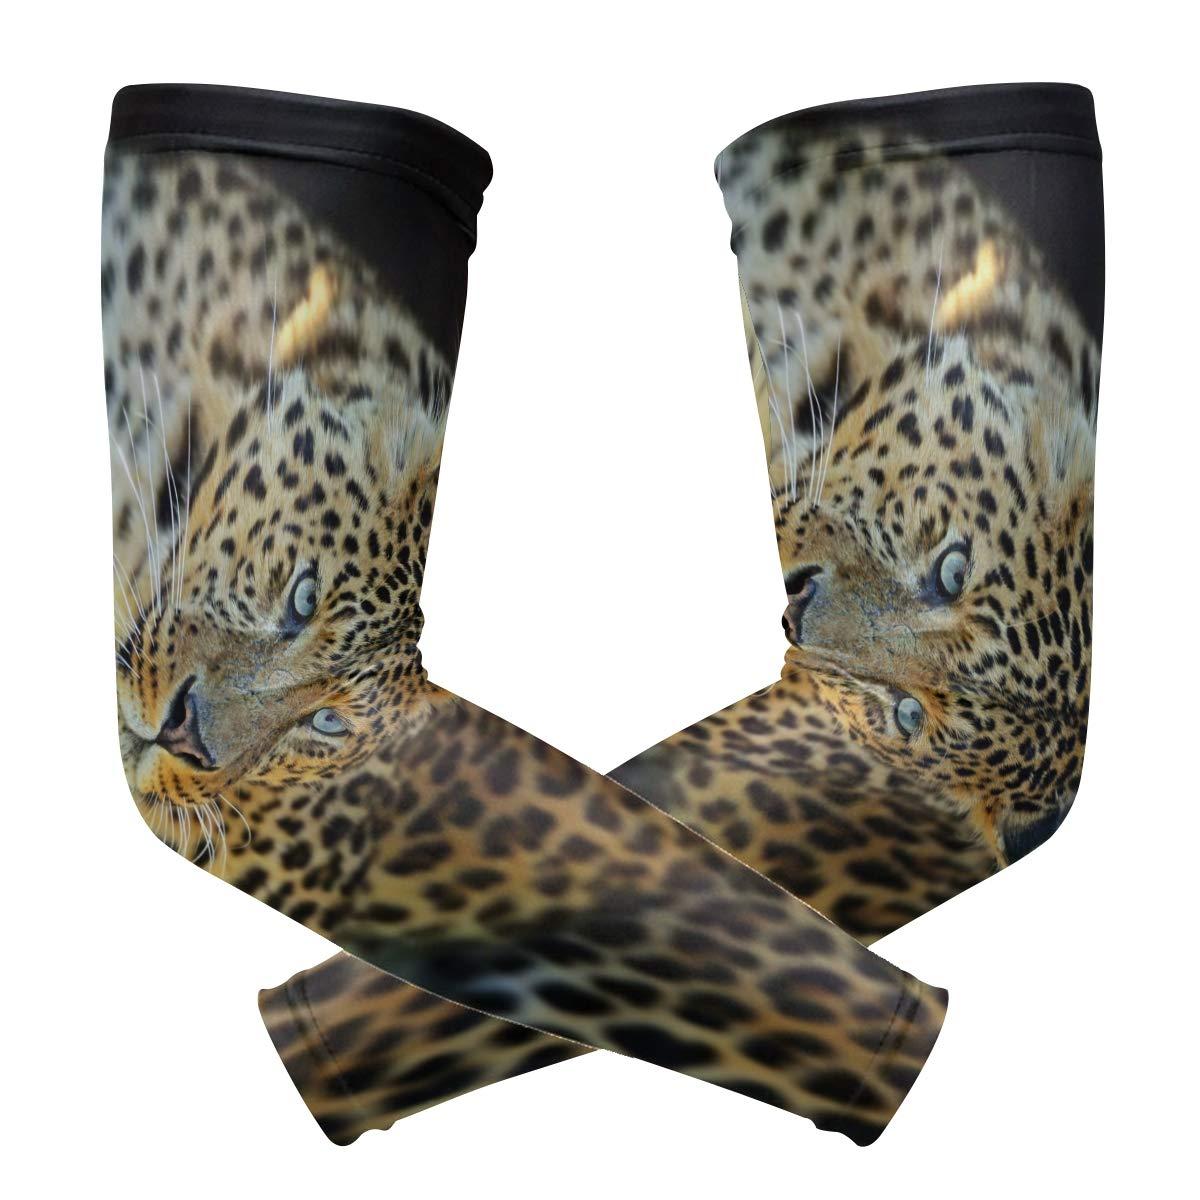 franzibla Leopardパターン印刷スポーツSleevelet Oversleeves Riding保護アームスリーブ B07G5LF8LR